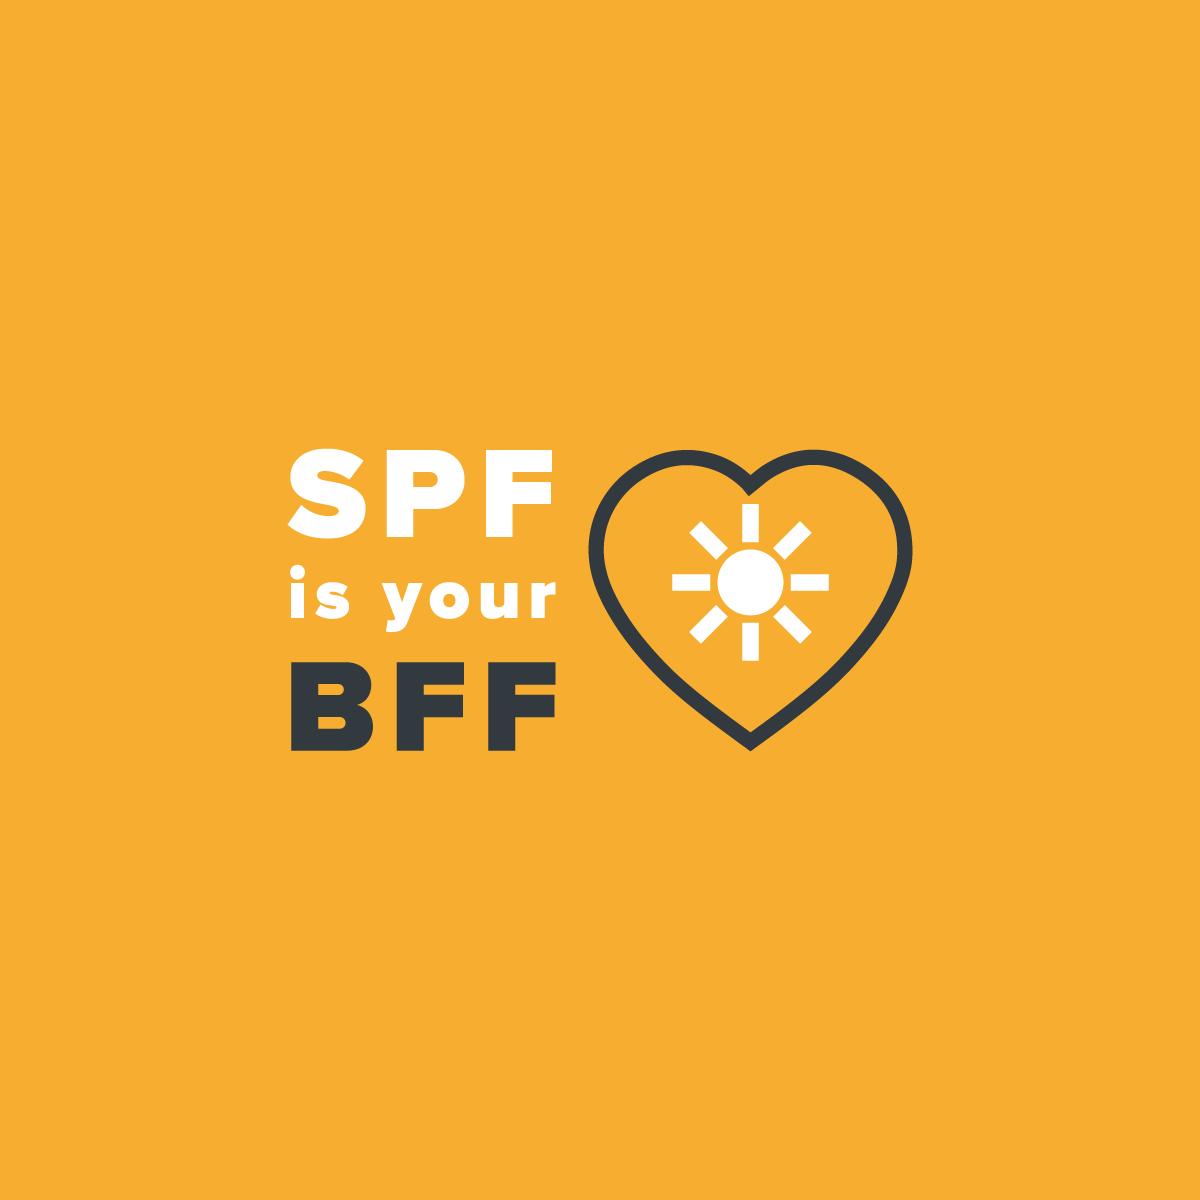 SPF is not just your summertime friend 😎 😍 ☀️  #JerseyBeautyCo #HappyRemarkableYou #Skincare #HealthySkin #HappySkin #BBloggers #Beauty #Beautiful #Remarkable #CelebrateYou #SelfCare #SelfEsteem